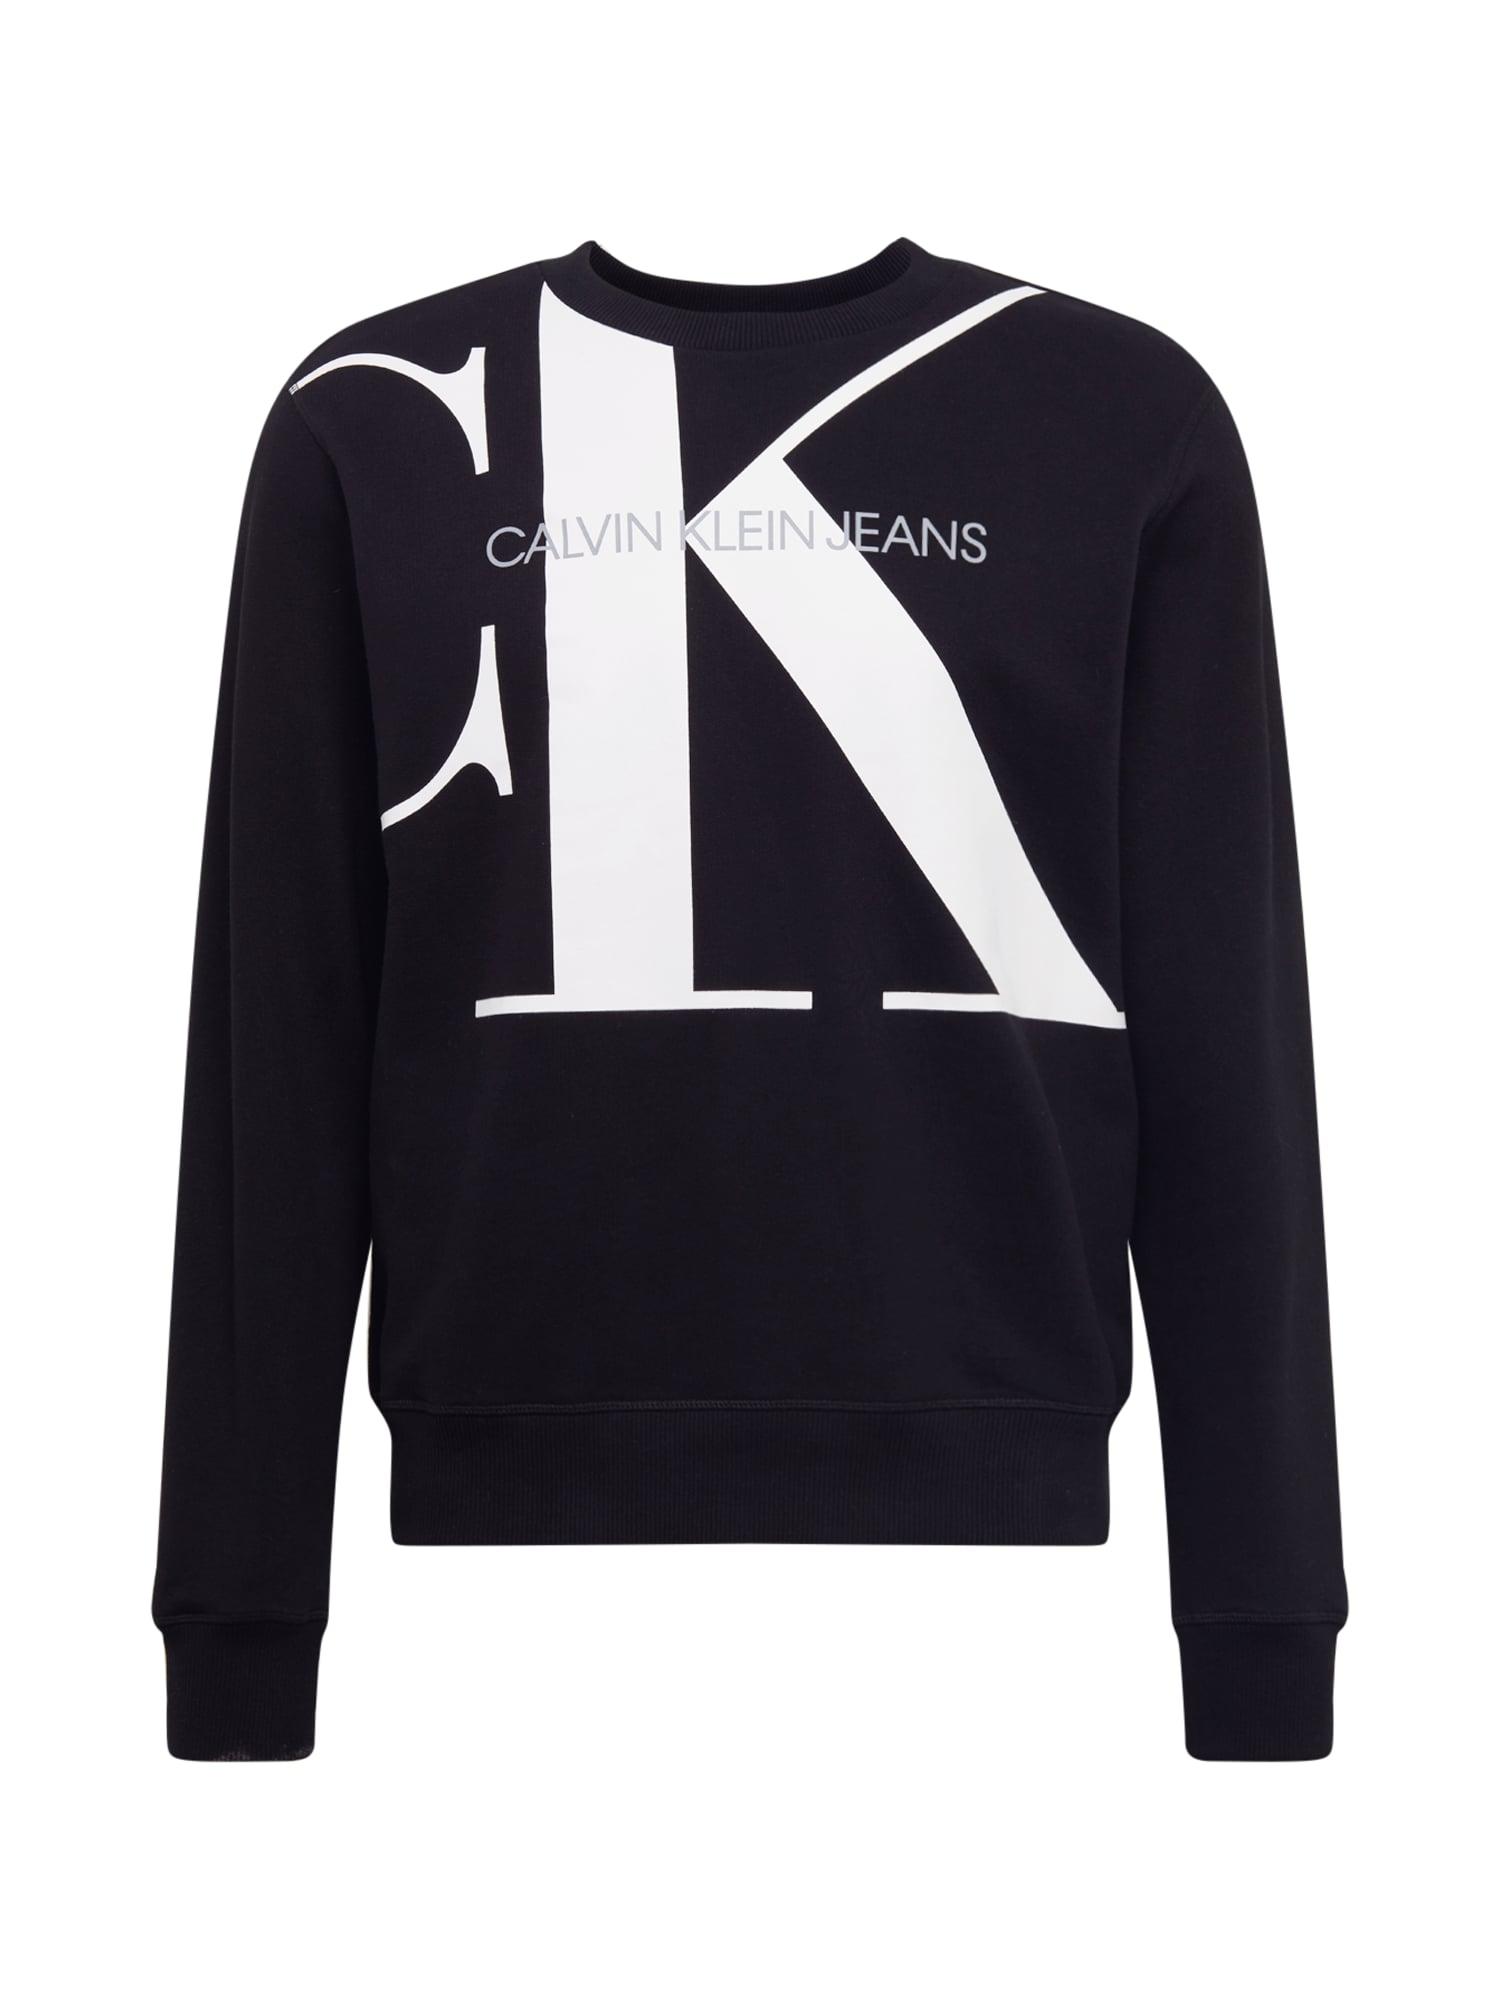 Calvin Klein Jeans Megztinis be užsegimo 'Upscale Monogram' juoda / balta